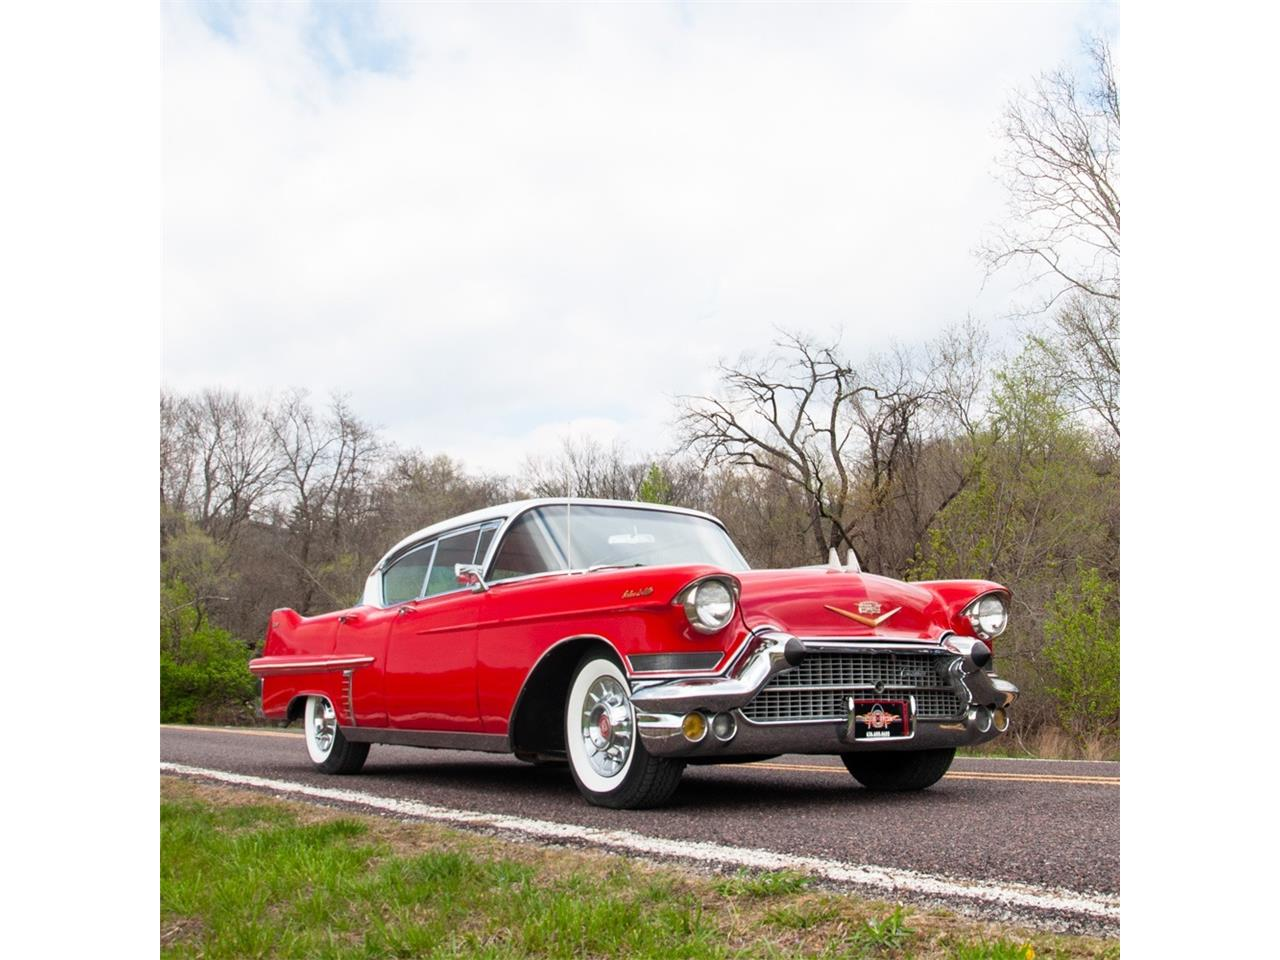 1957 cadillac sedan deville for sale   classiccars   cc-1090099